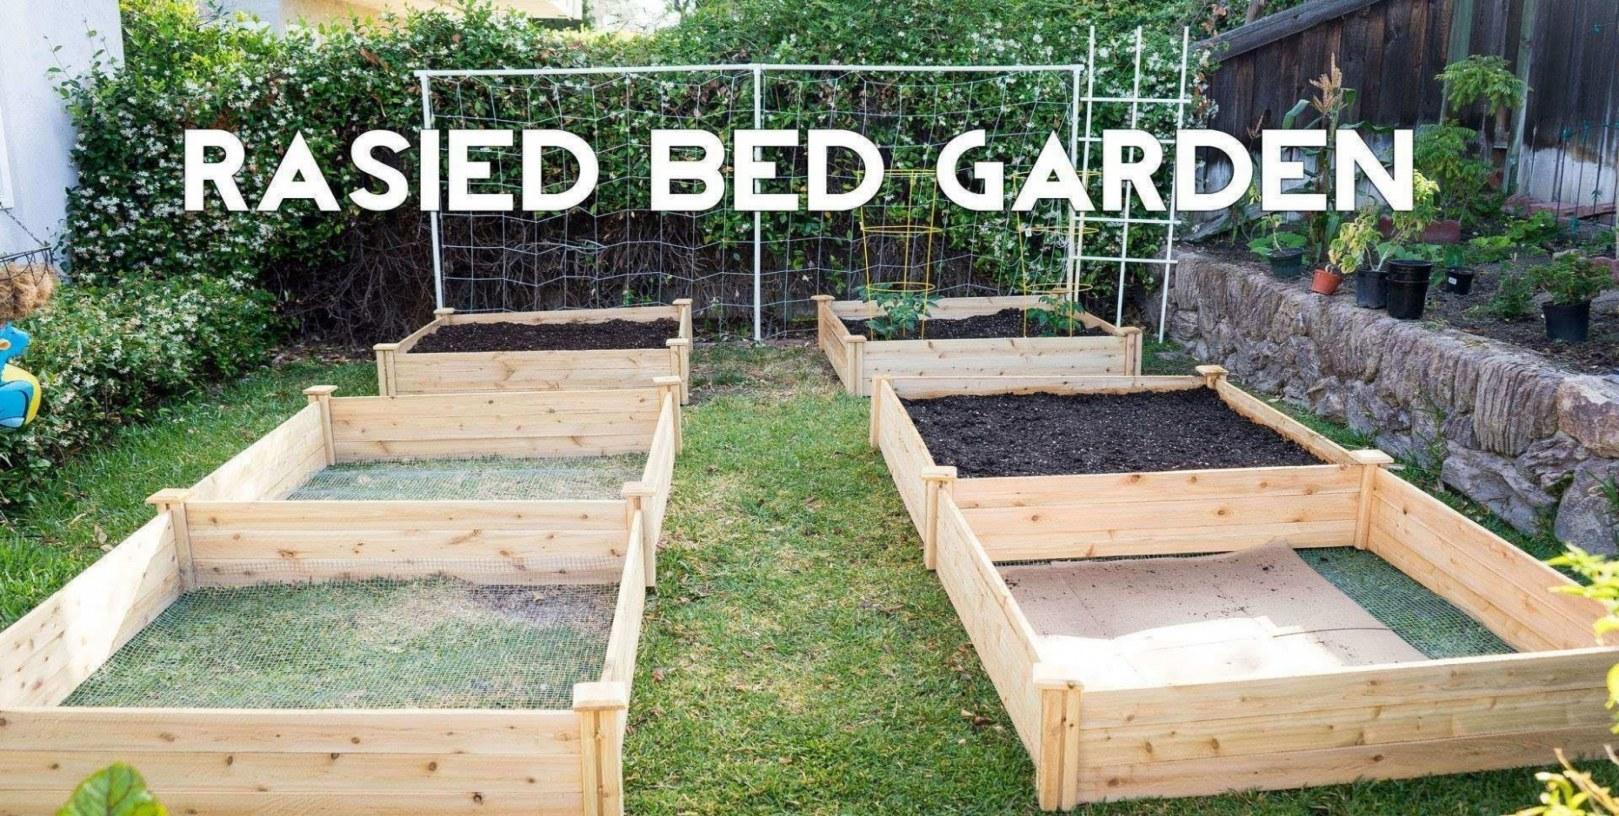 backyard design ideas raised garden design ideas jackolanternliquors of backyard design ideas